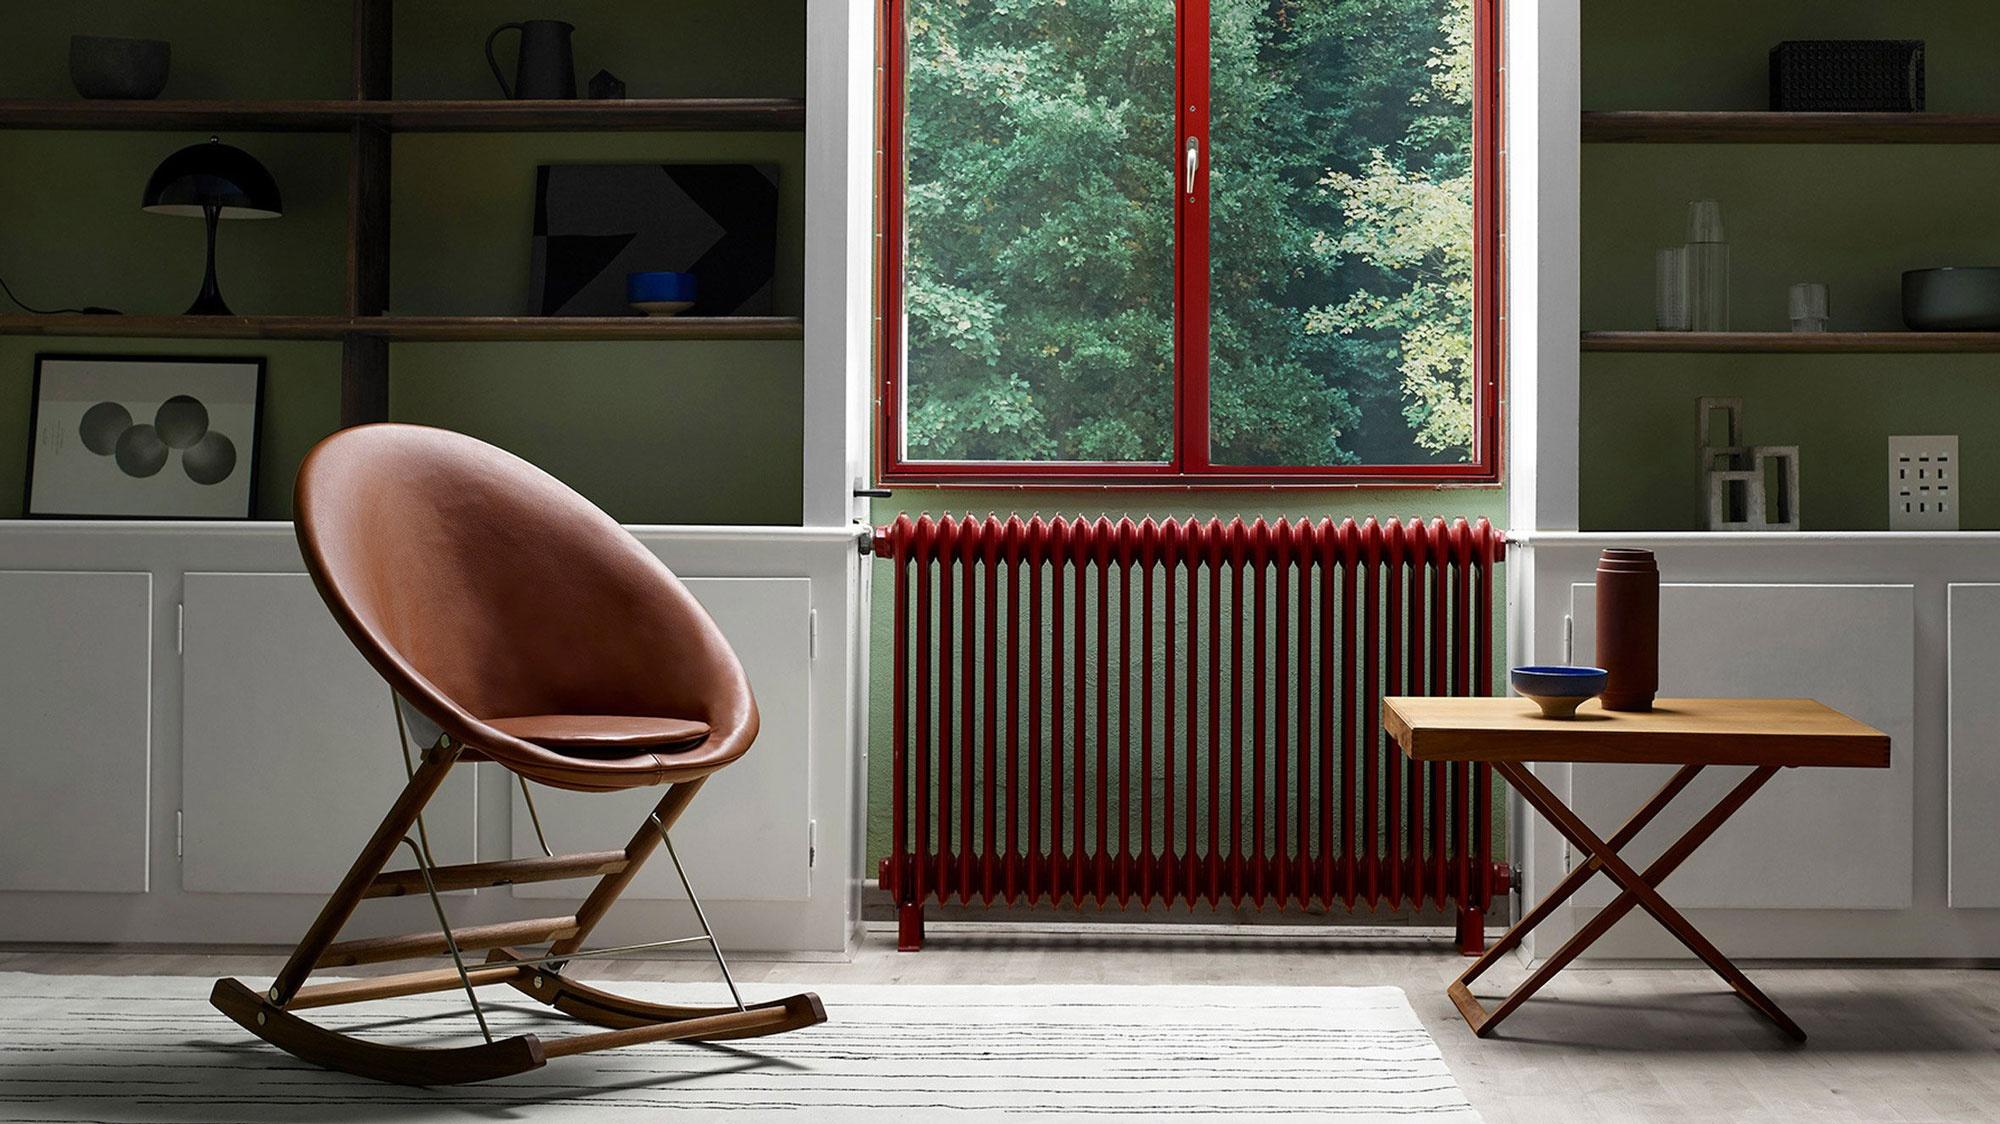 rocking-chair-anker-bak-carl-hansen-gessato-1